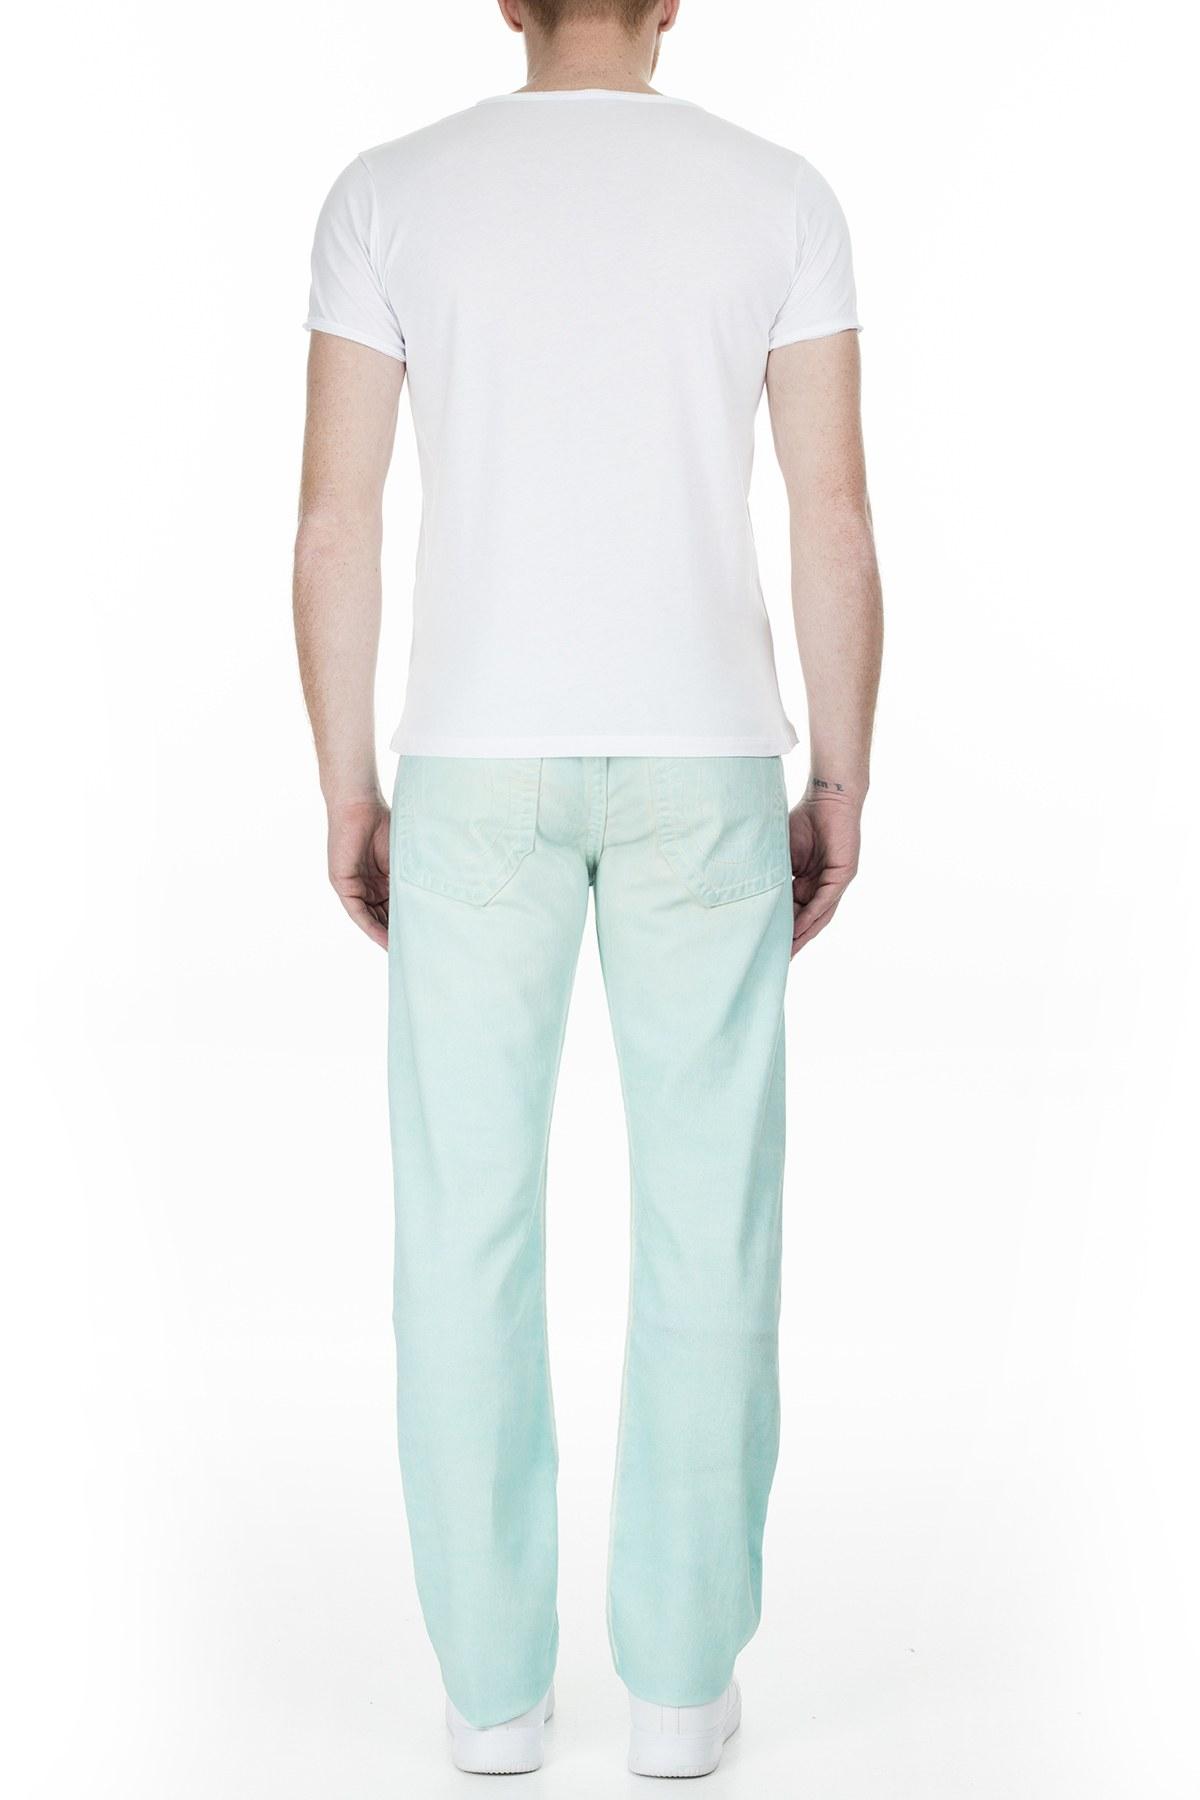 True Religion Jeans Erkek Kot Pantolon M58J19Y13 AQUA